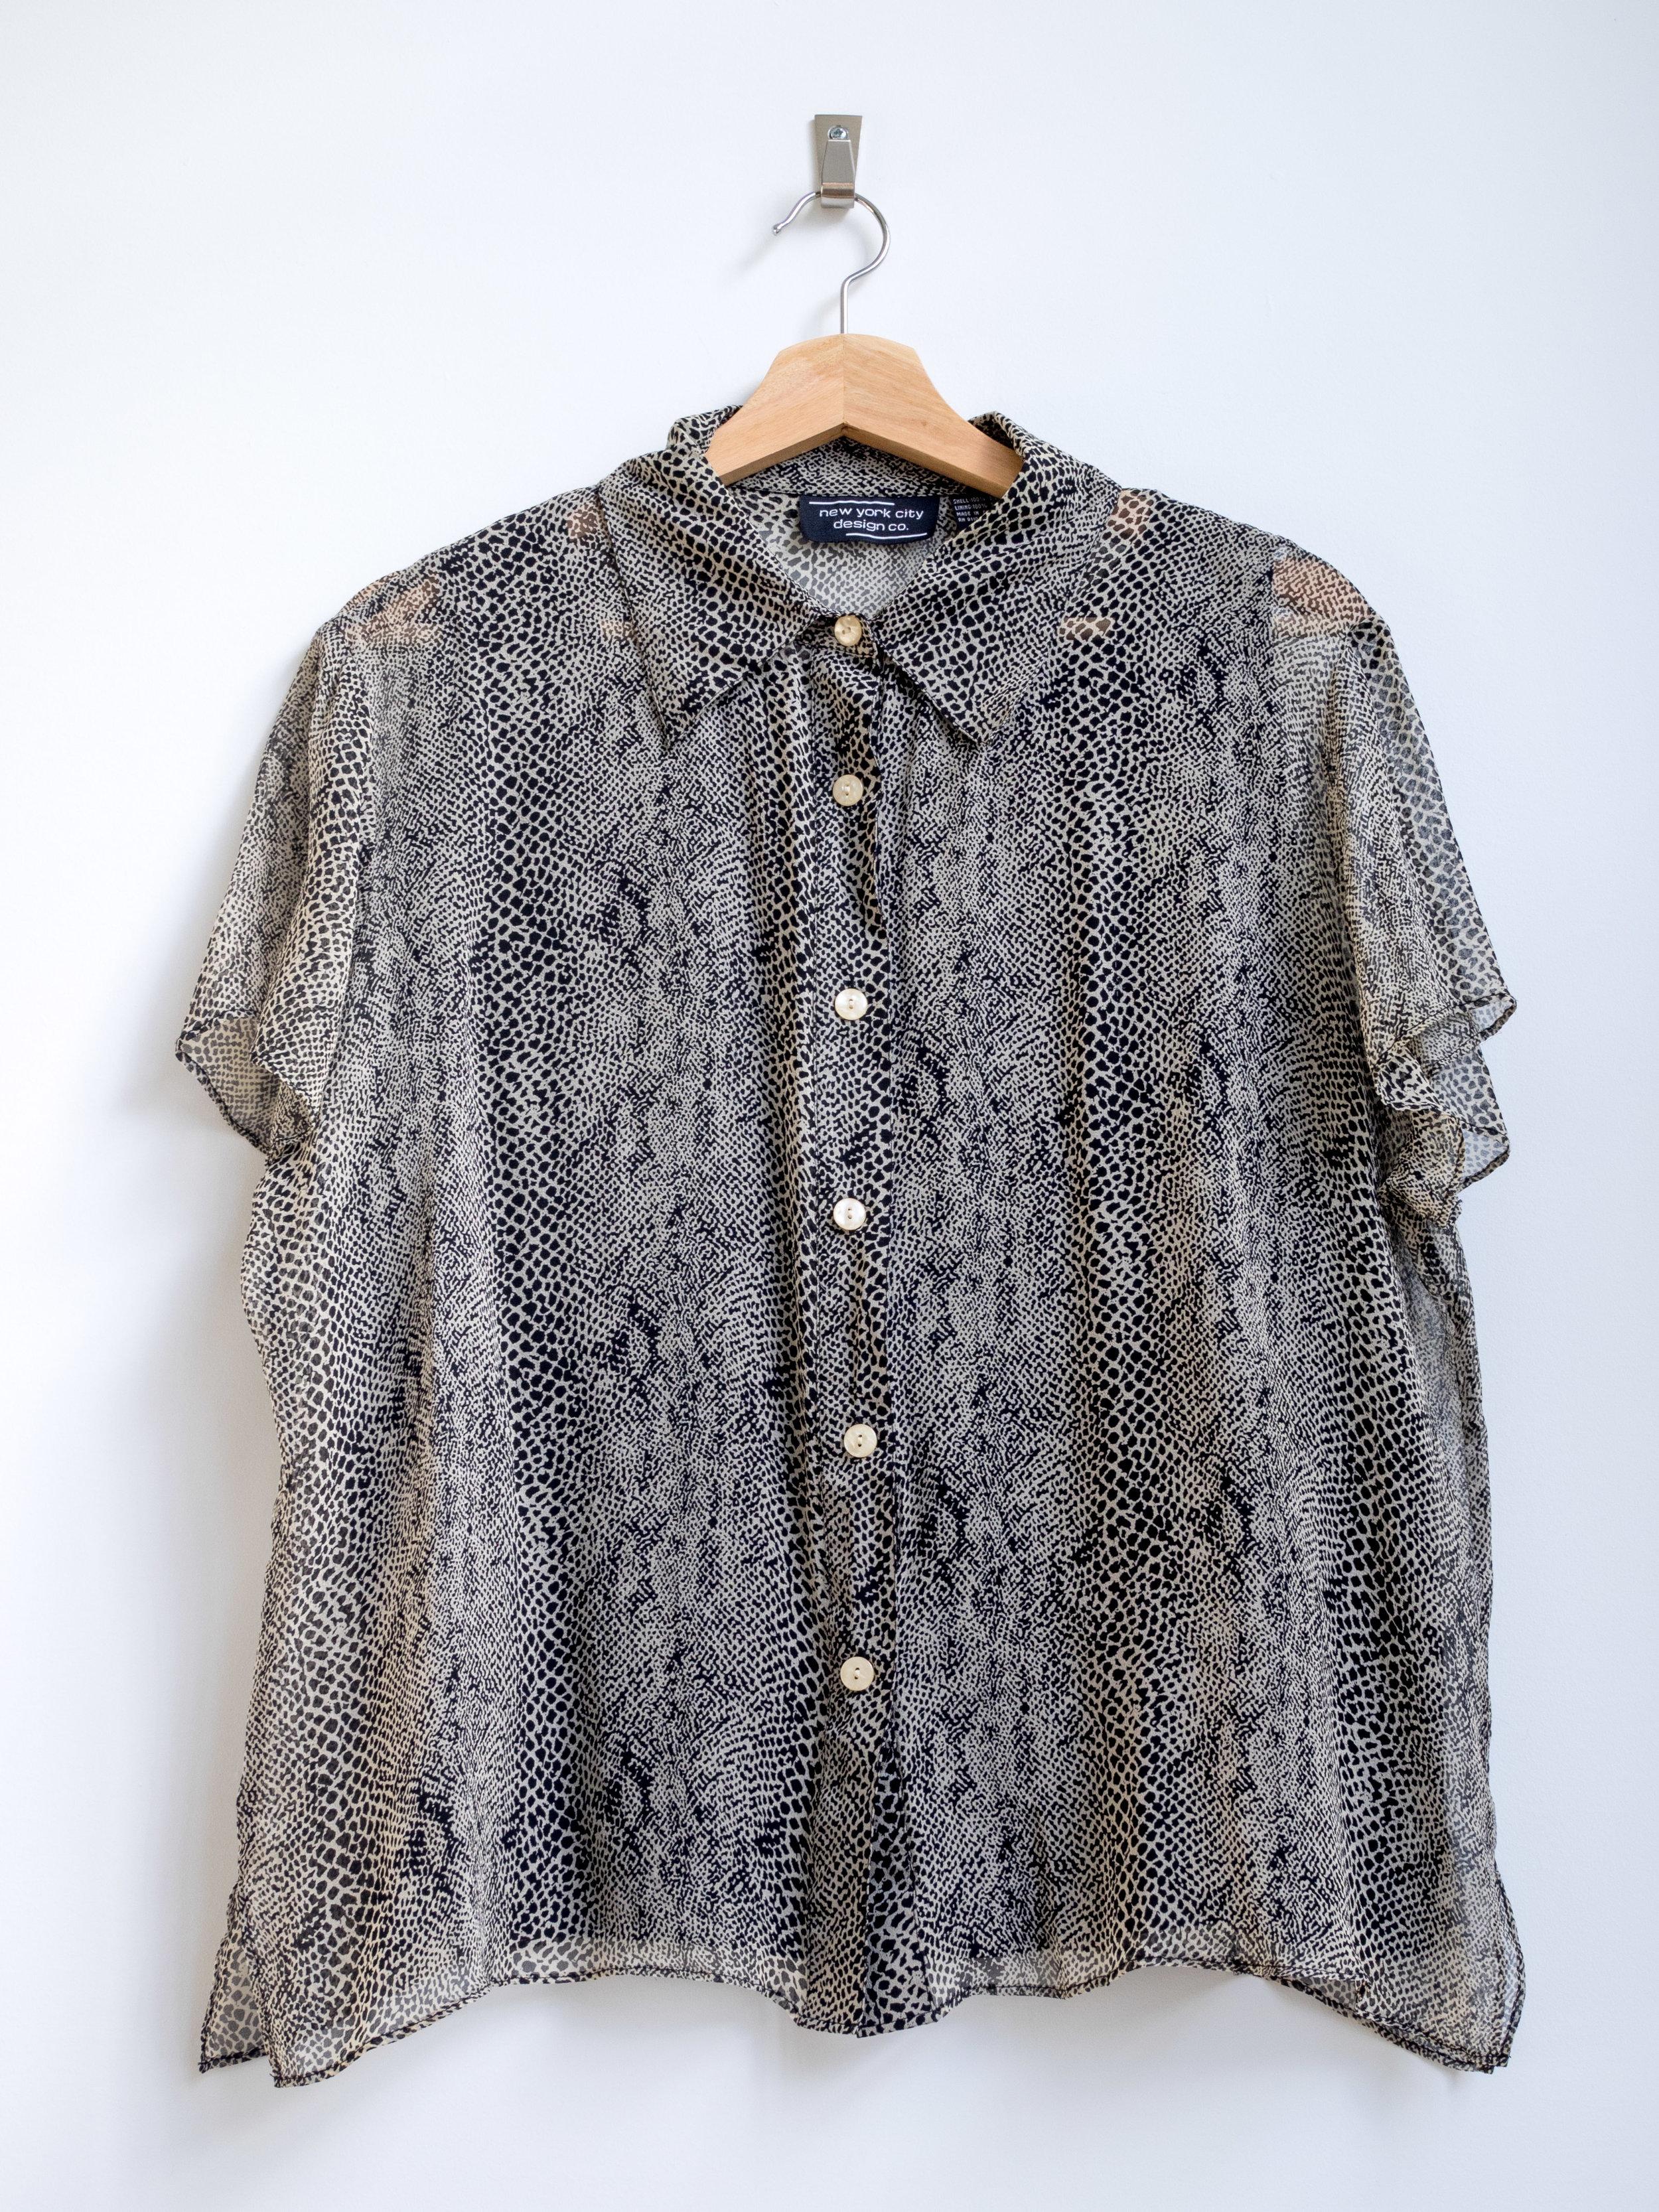 8f64dcdd9083 ... Vintage Silk Animal Print Blouse w/ Tank Lining. TCP-180032.jpg.  TCP-180030.jpg